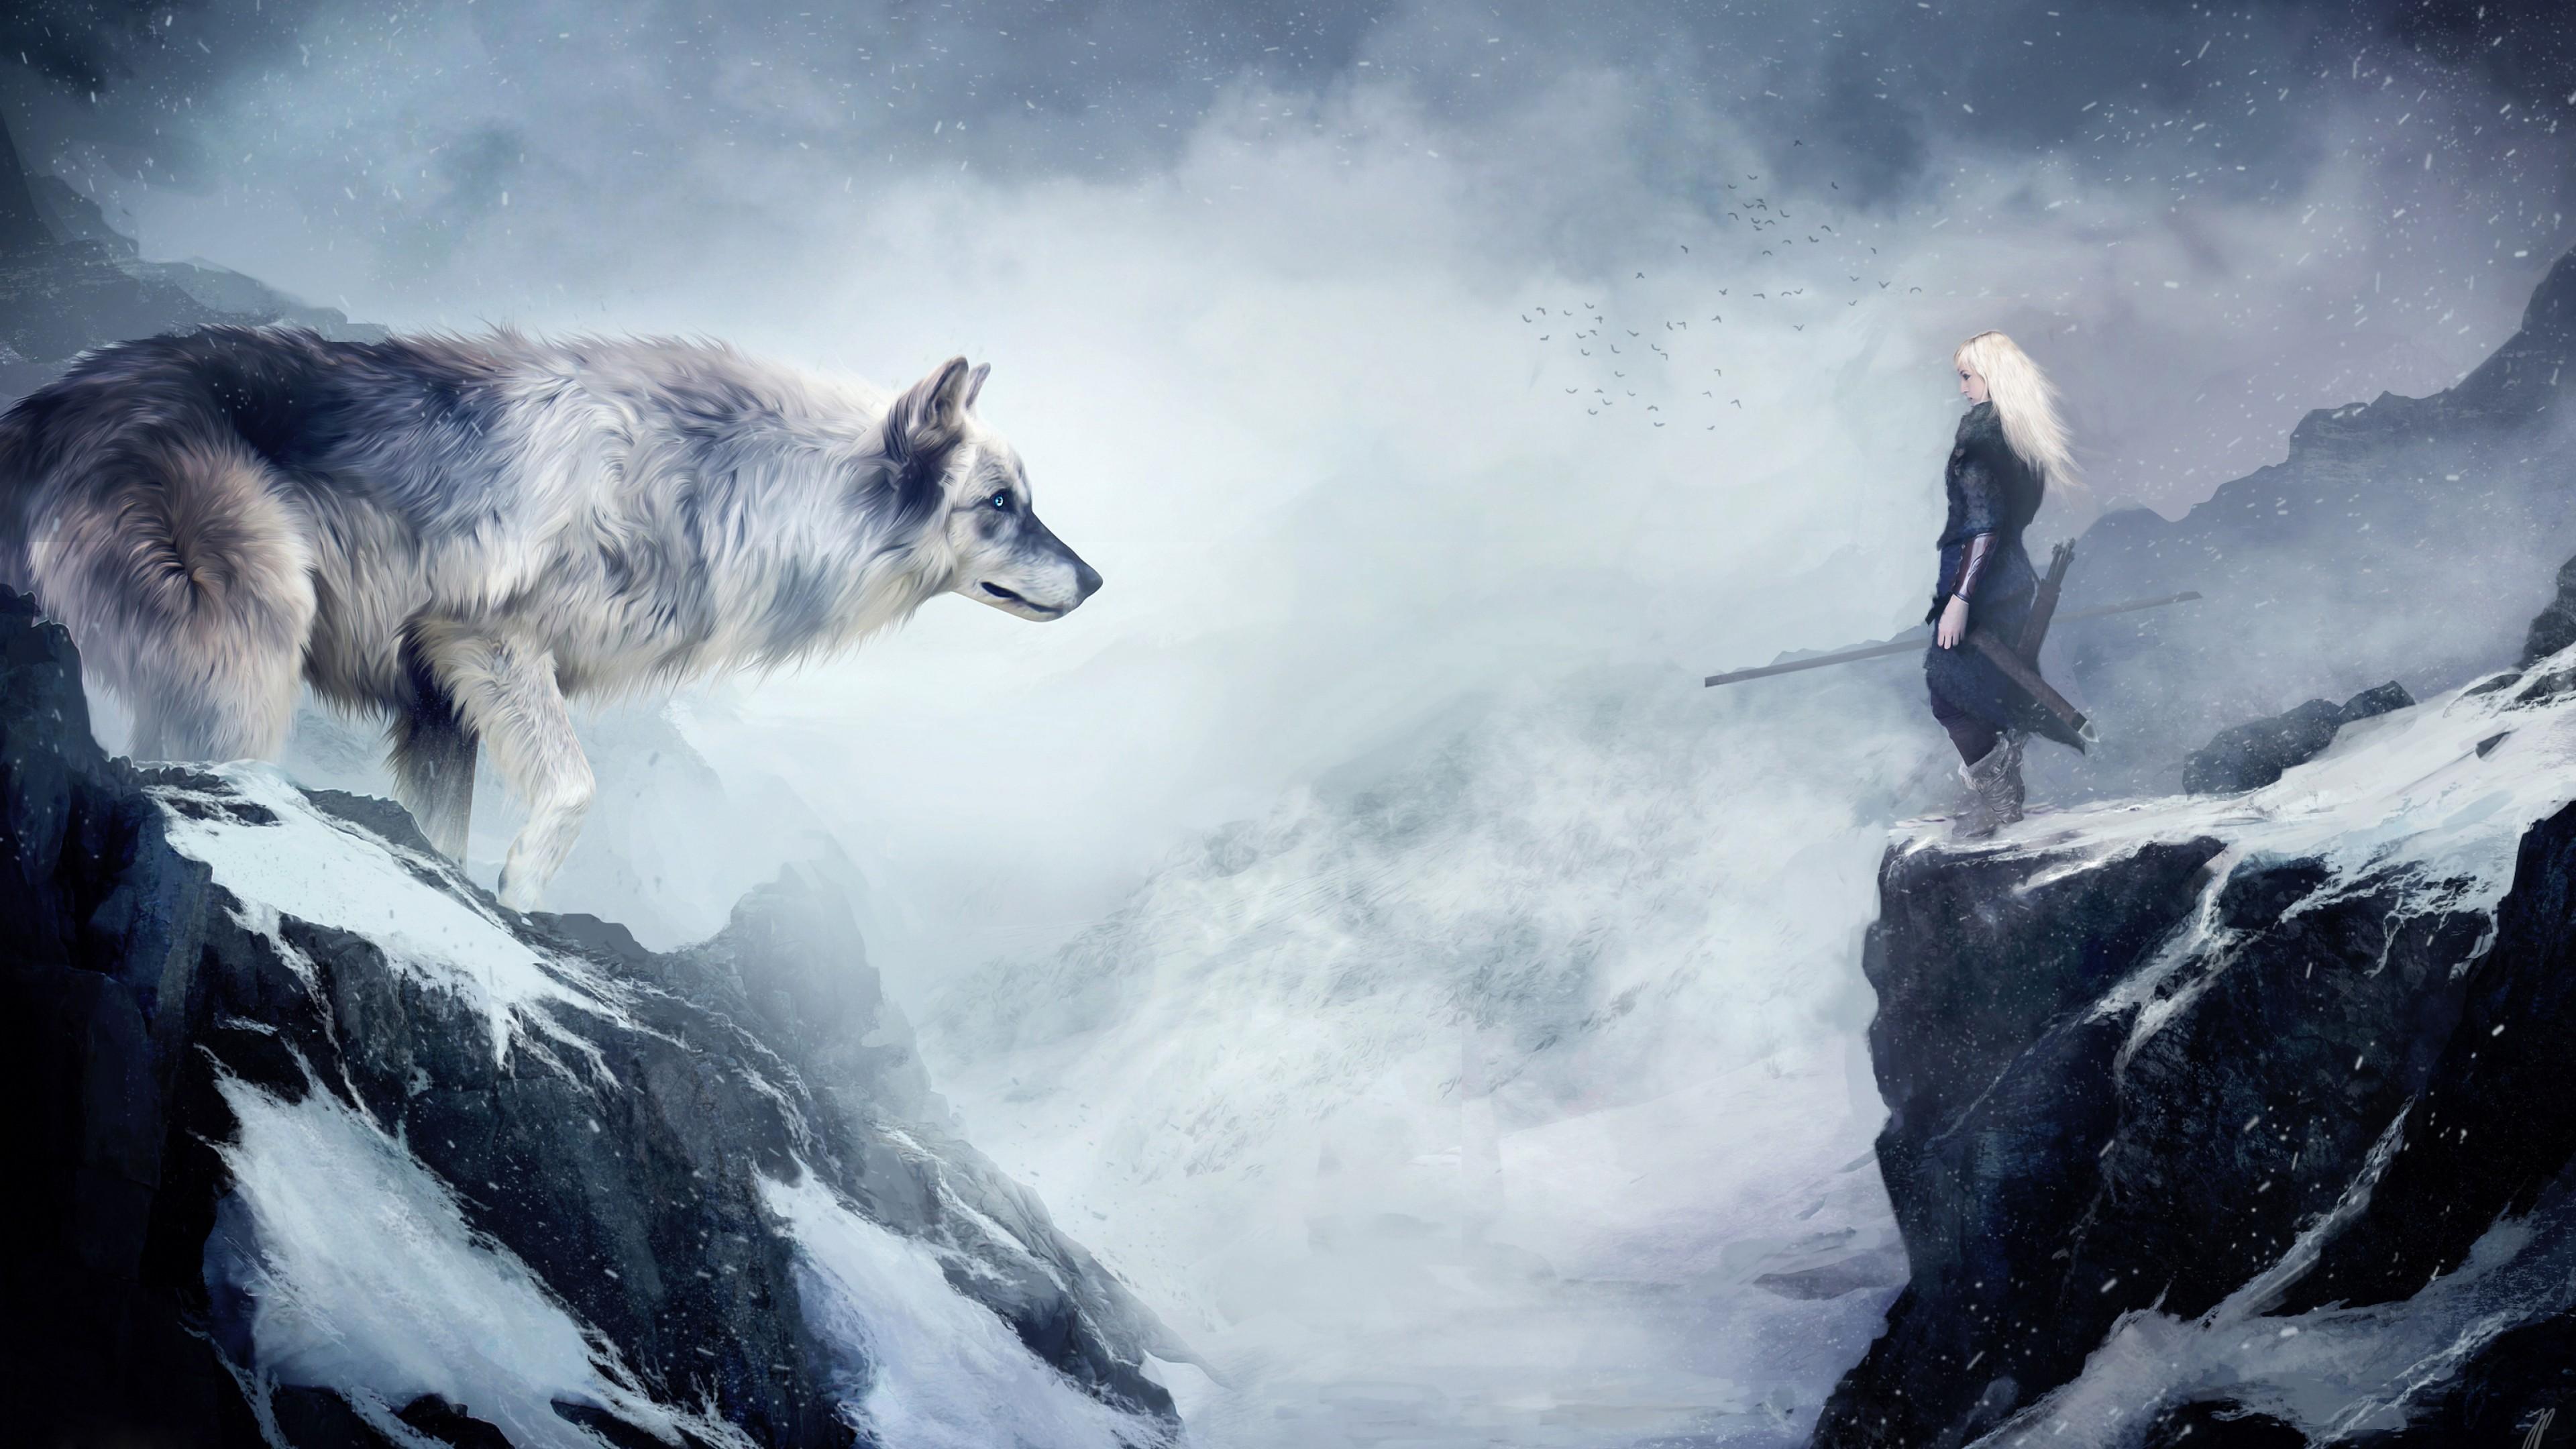 Wallpaper Wolf 4k HD Mountain Girl Animals Winter